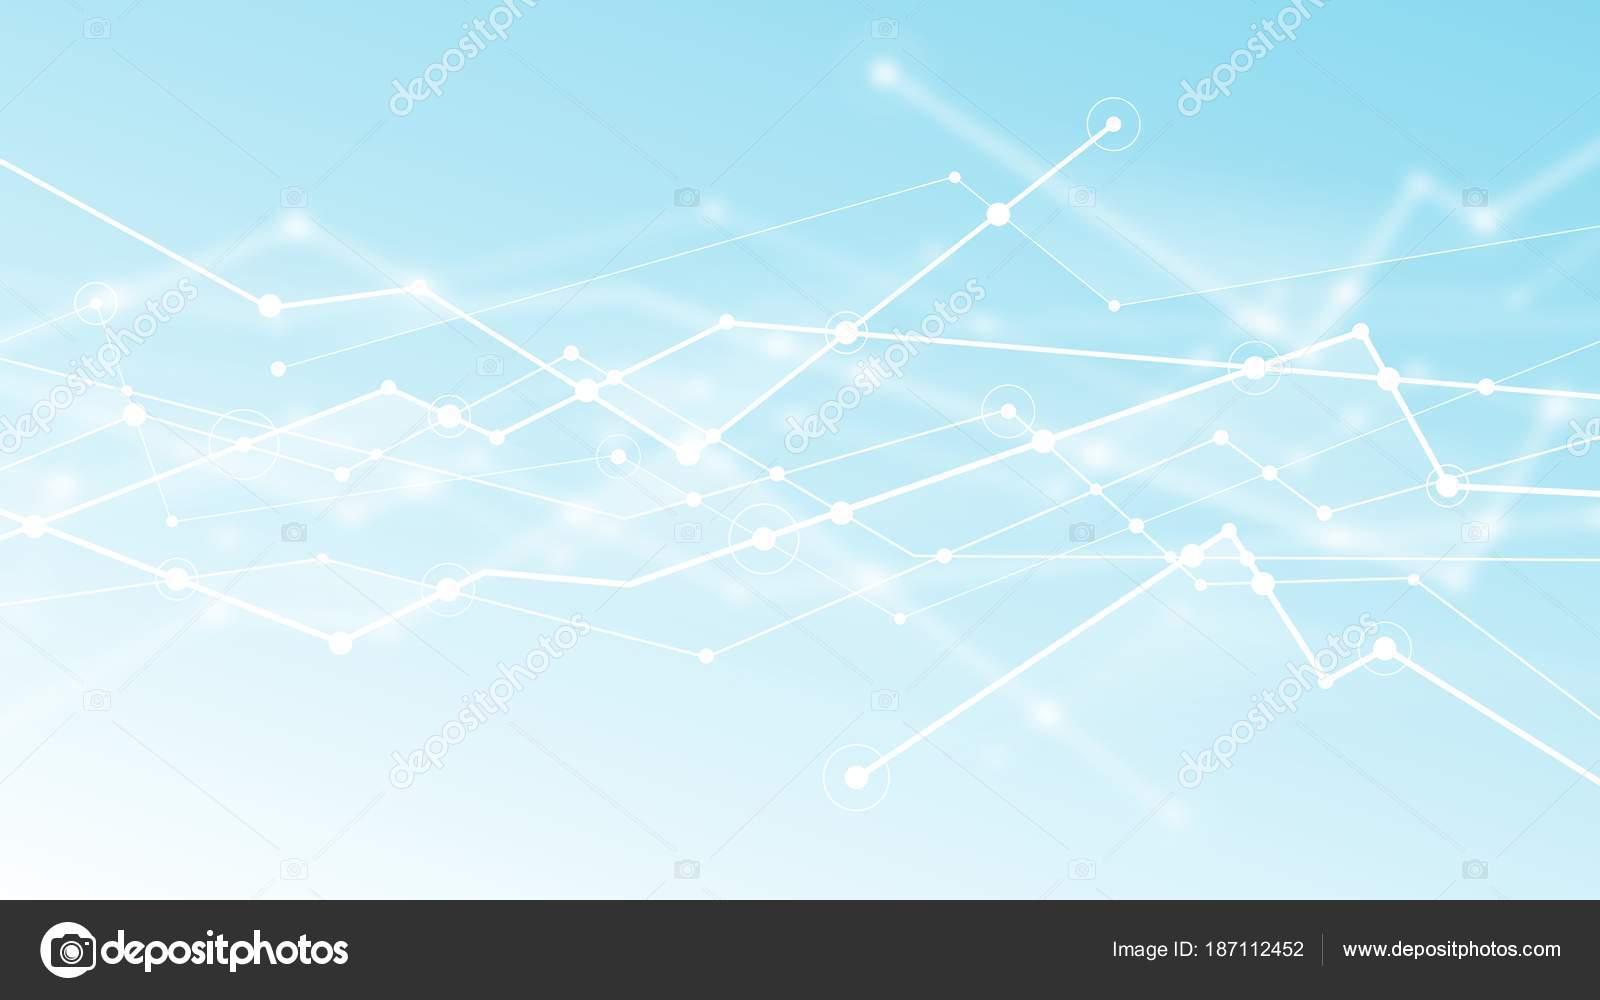 abstract futuristic blockchain light blue background vector design digital network stock photo